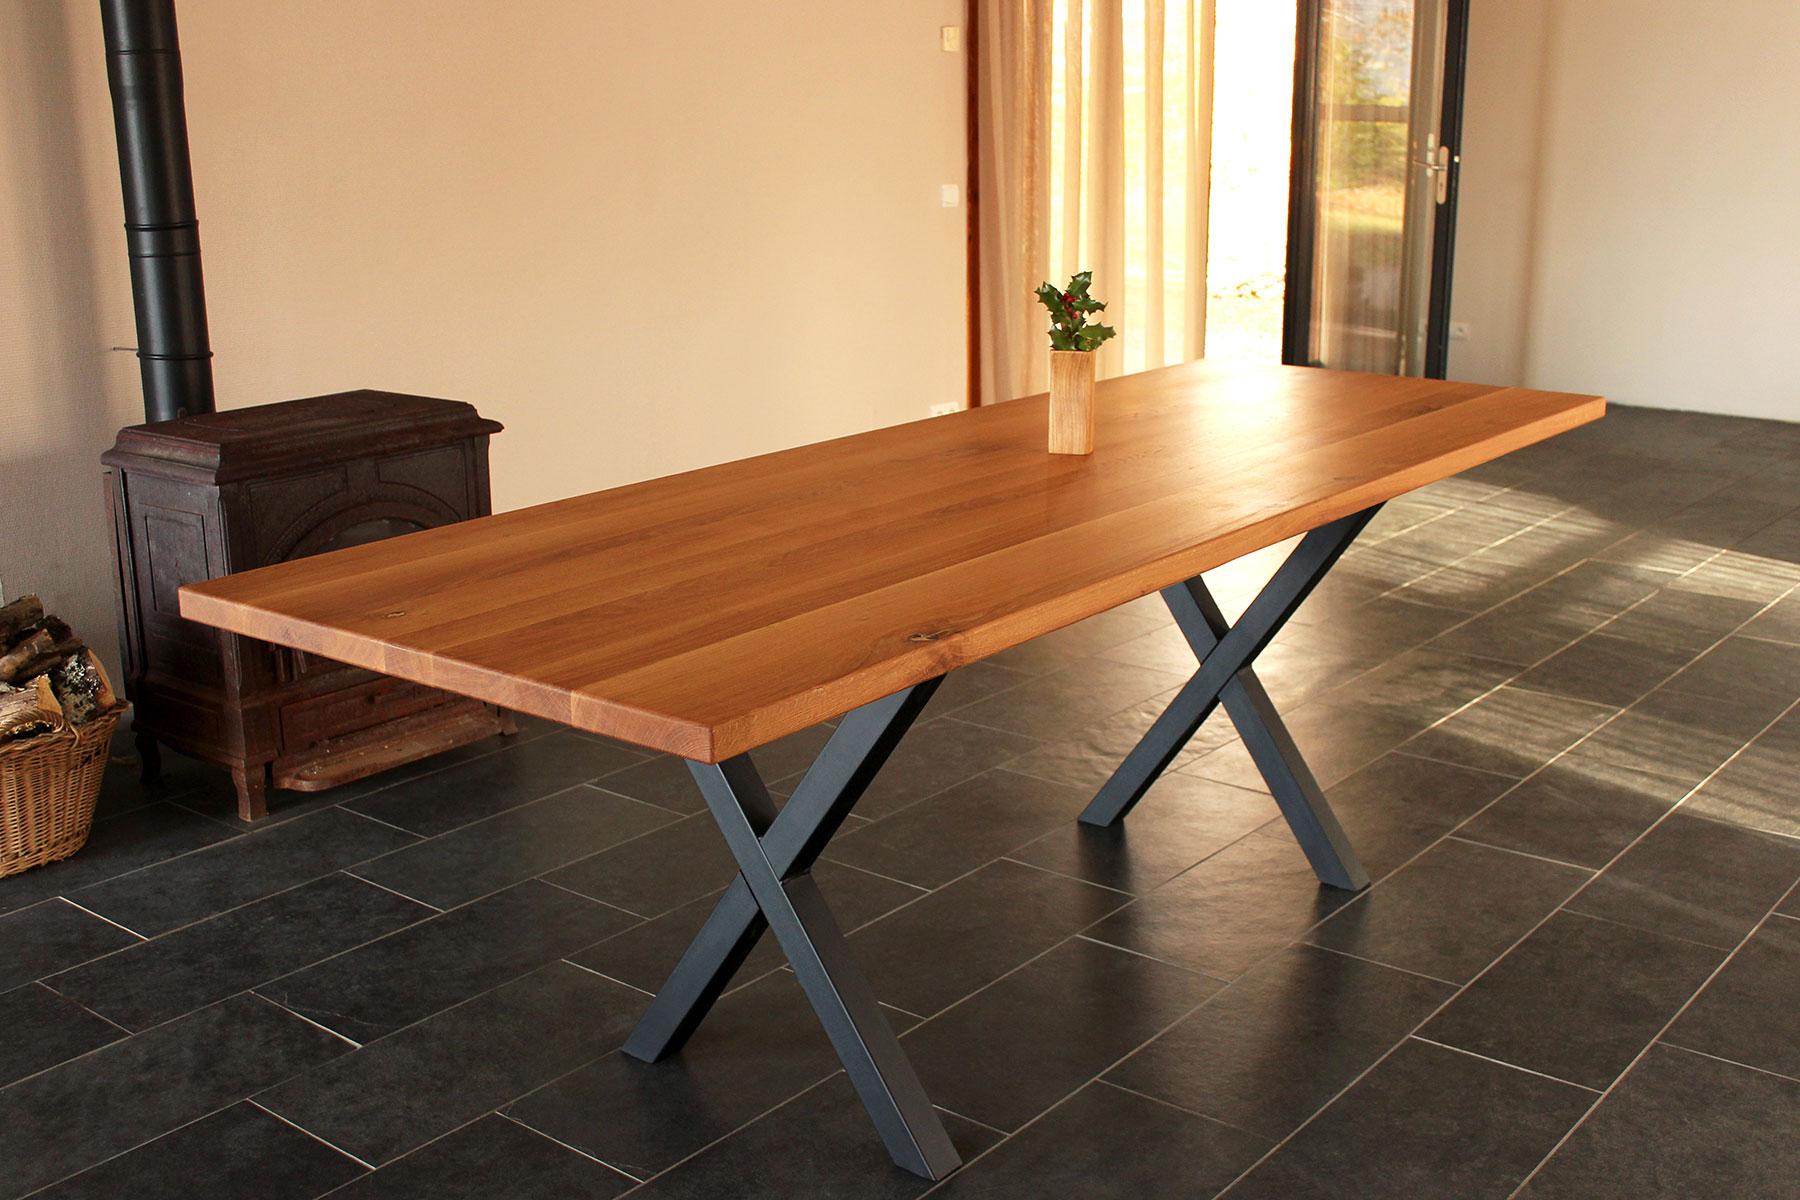 Oak-dinner-table-Dining-Room-furniture-FabsFurniture